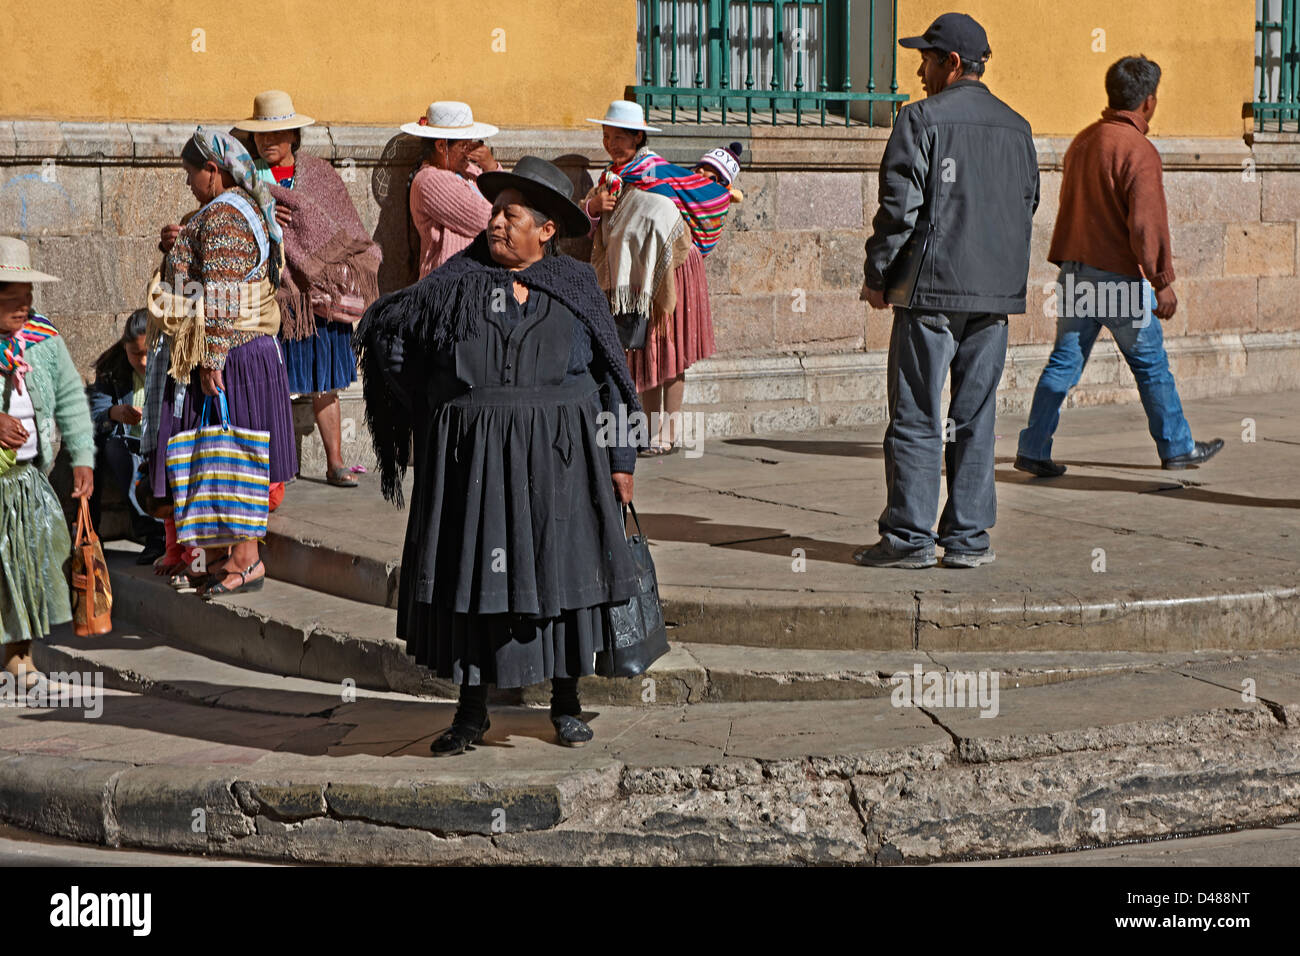 Indigena or locals in Potosi, Bolivia, South America - Stock Image